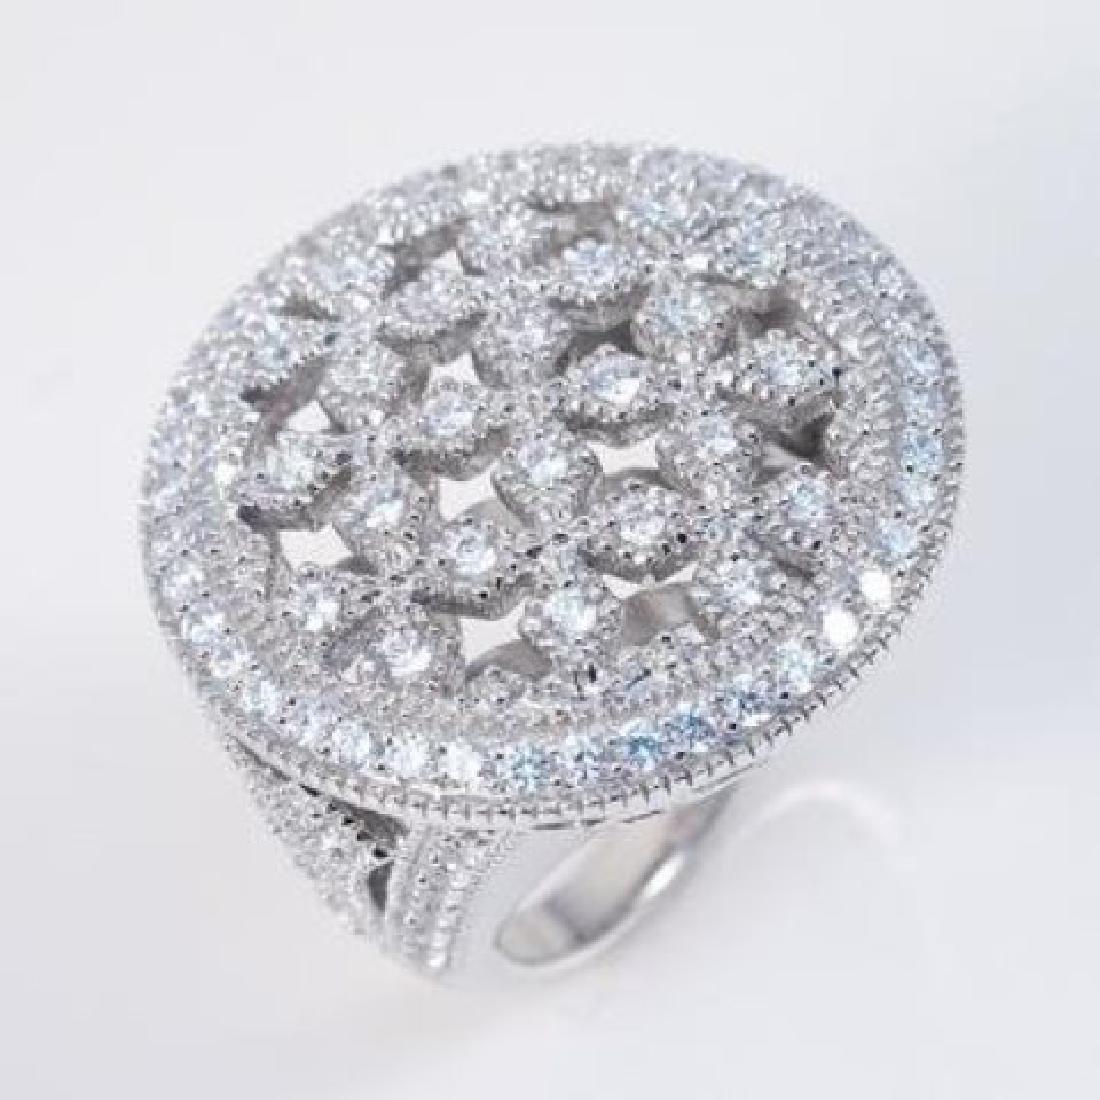 Antique Ring Diamonds Creation 2.00ct 8k W/g Over